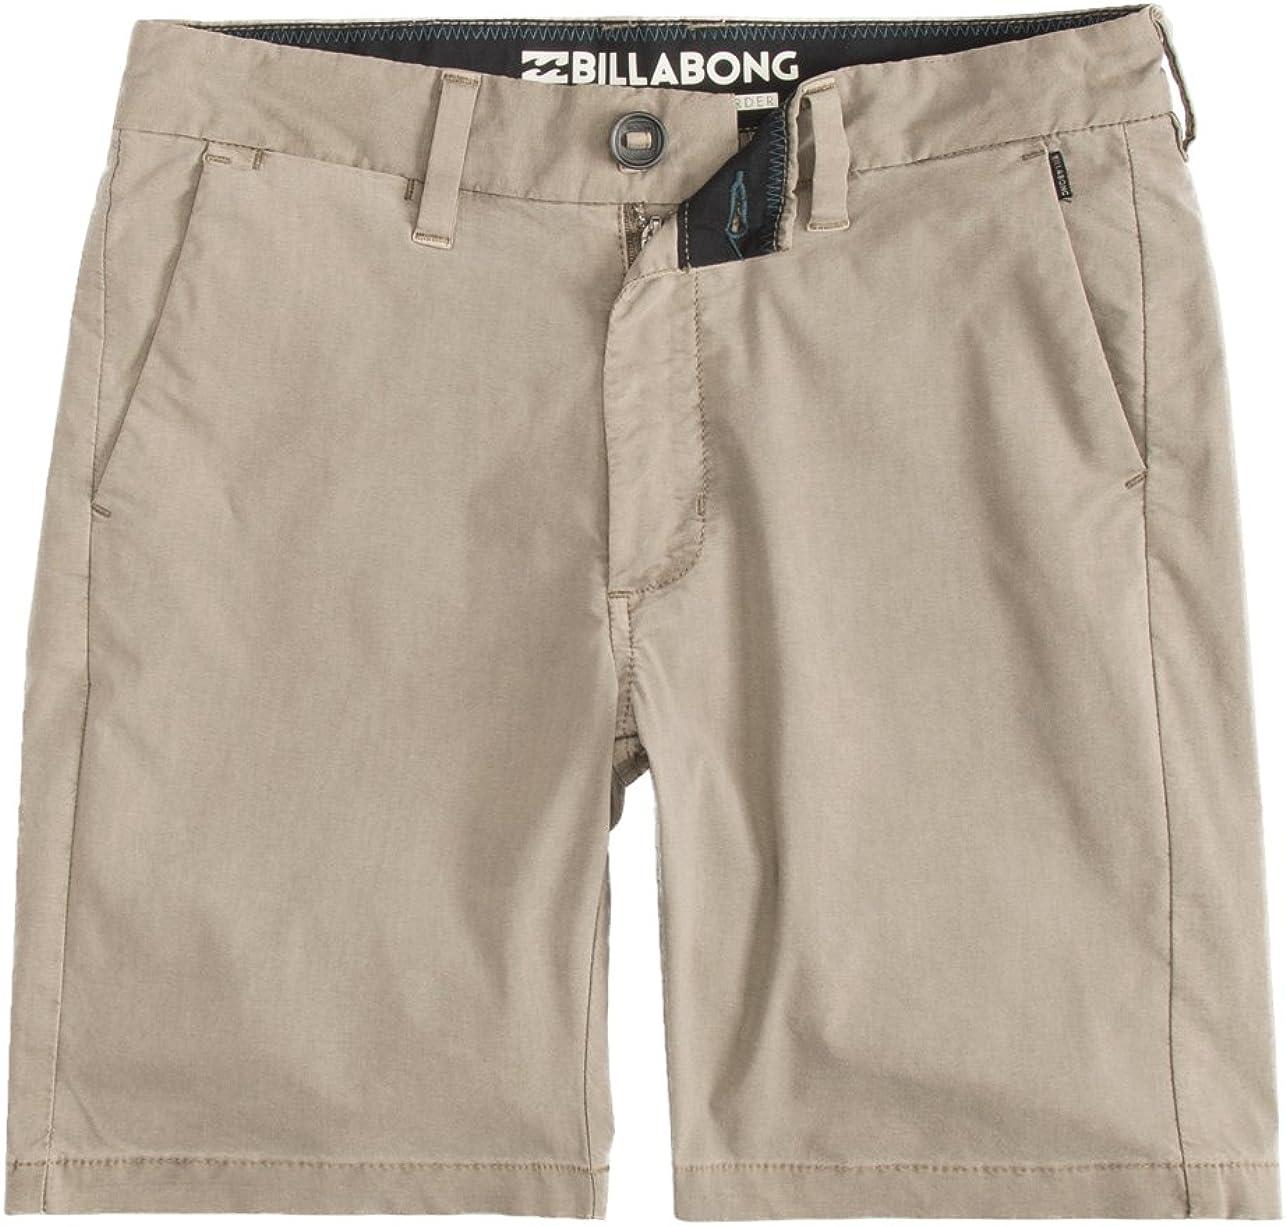 Khaki 22 Big Kids 8 Big Kids Slim Billabong Kids Boys New Order X Overdye Shorts